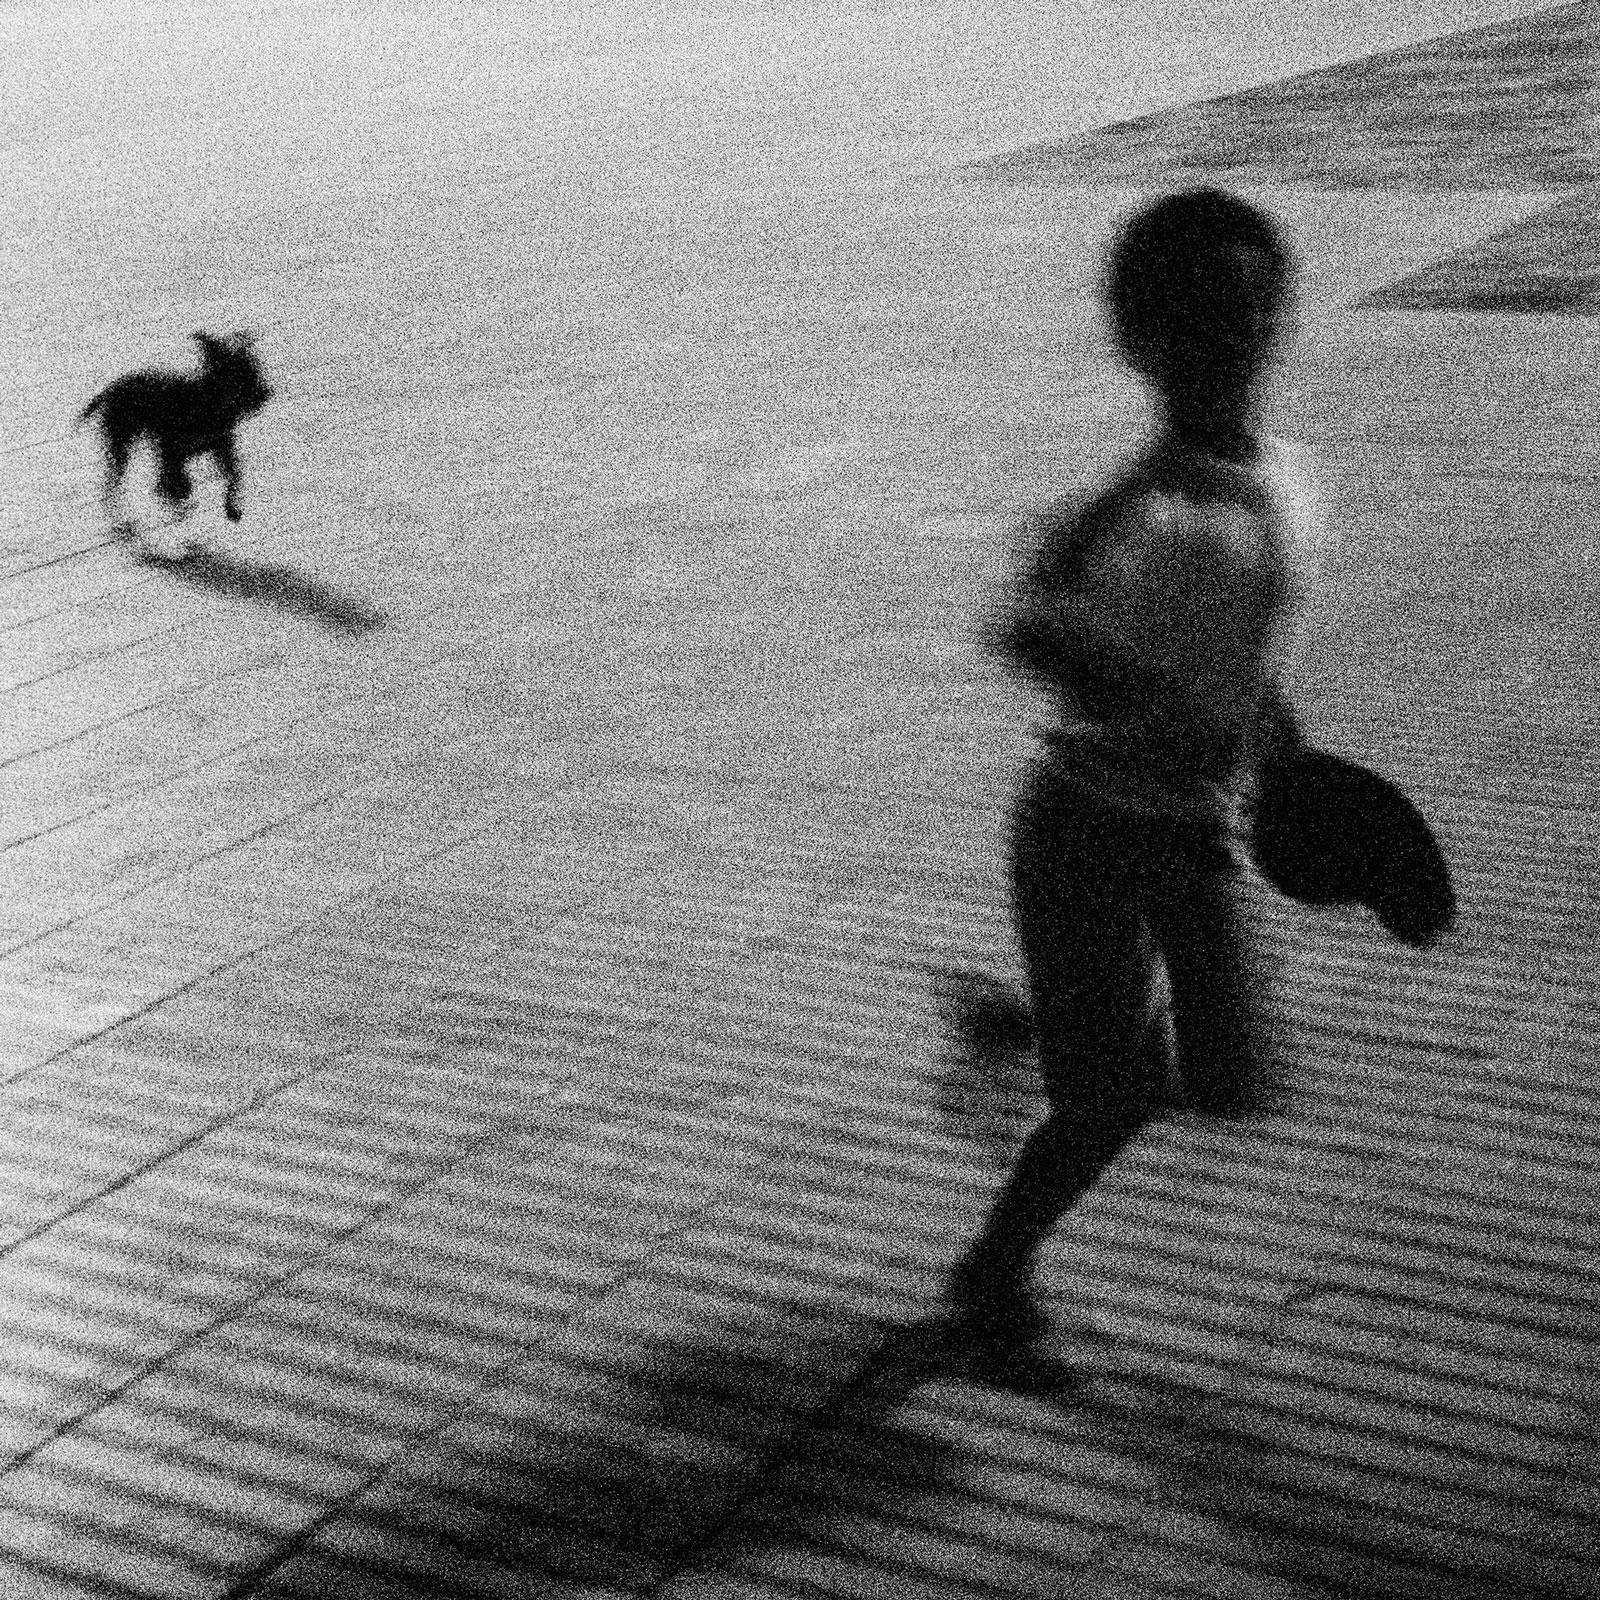 D'enfant, Maroc, 1999 © Laurence Leblanc